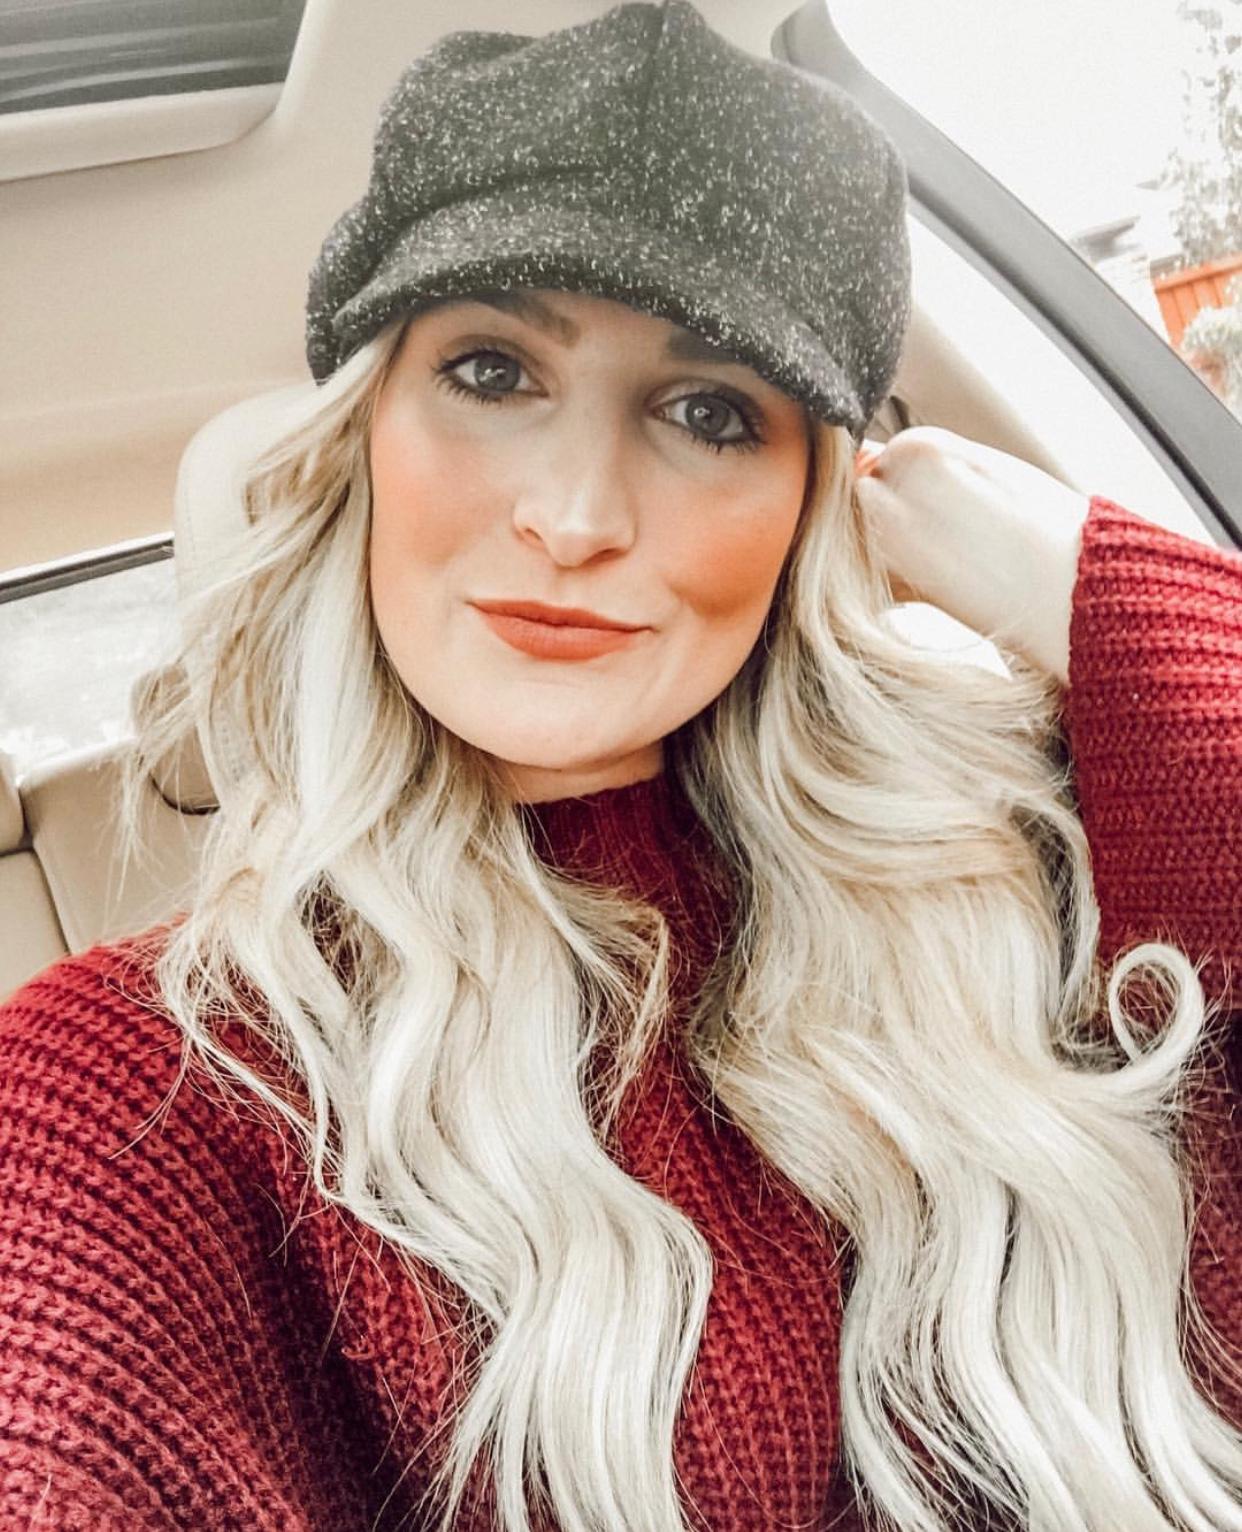 Newsboy cap | Bakersboy hat | cadet cap | Audrey Madison Stowe a fashion and lifestyle blogger